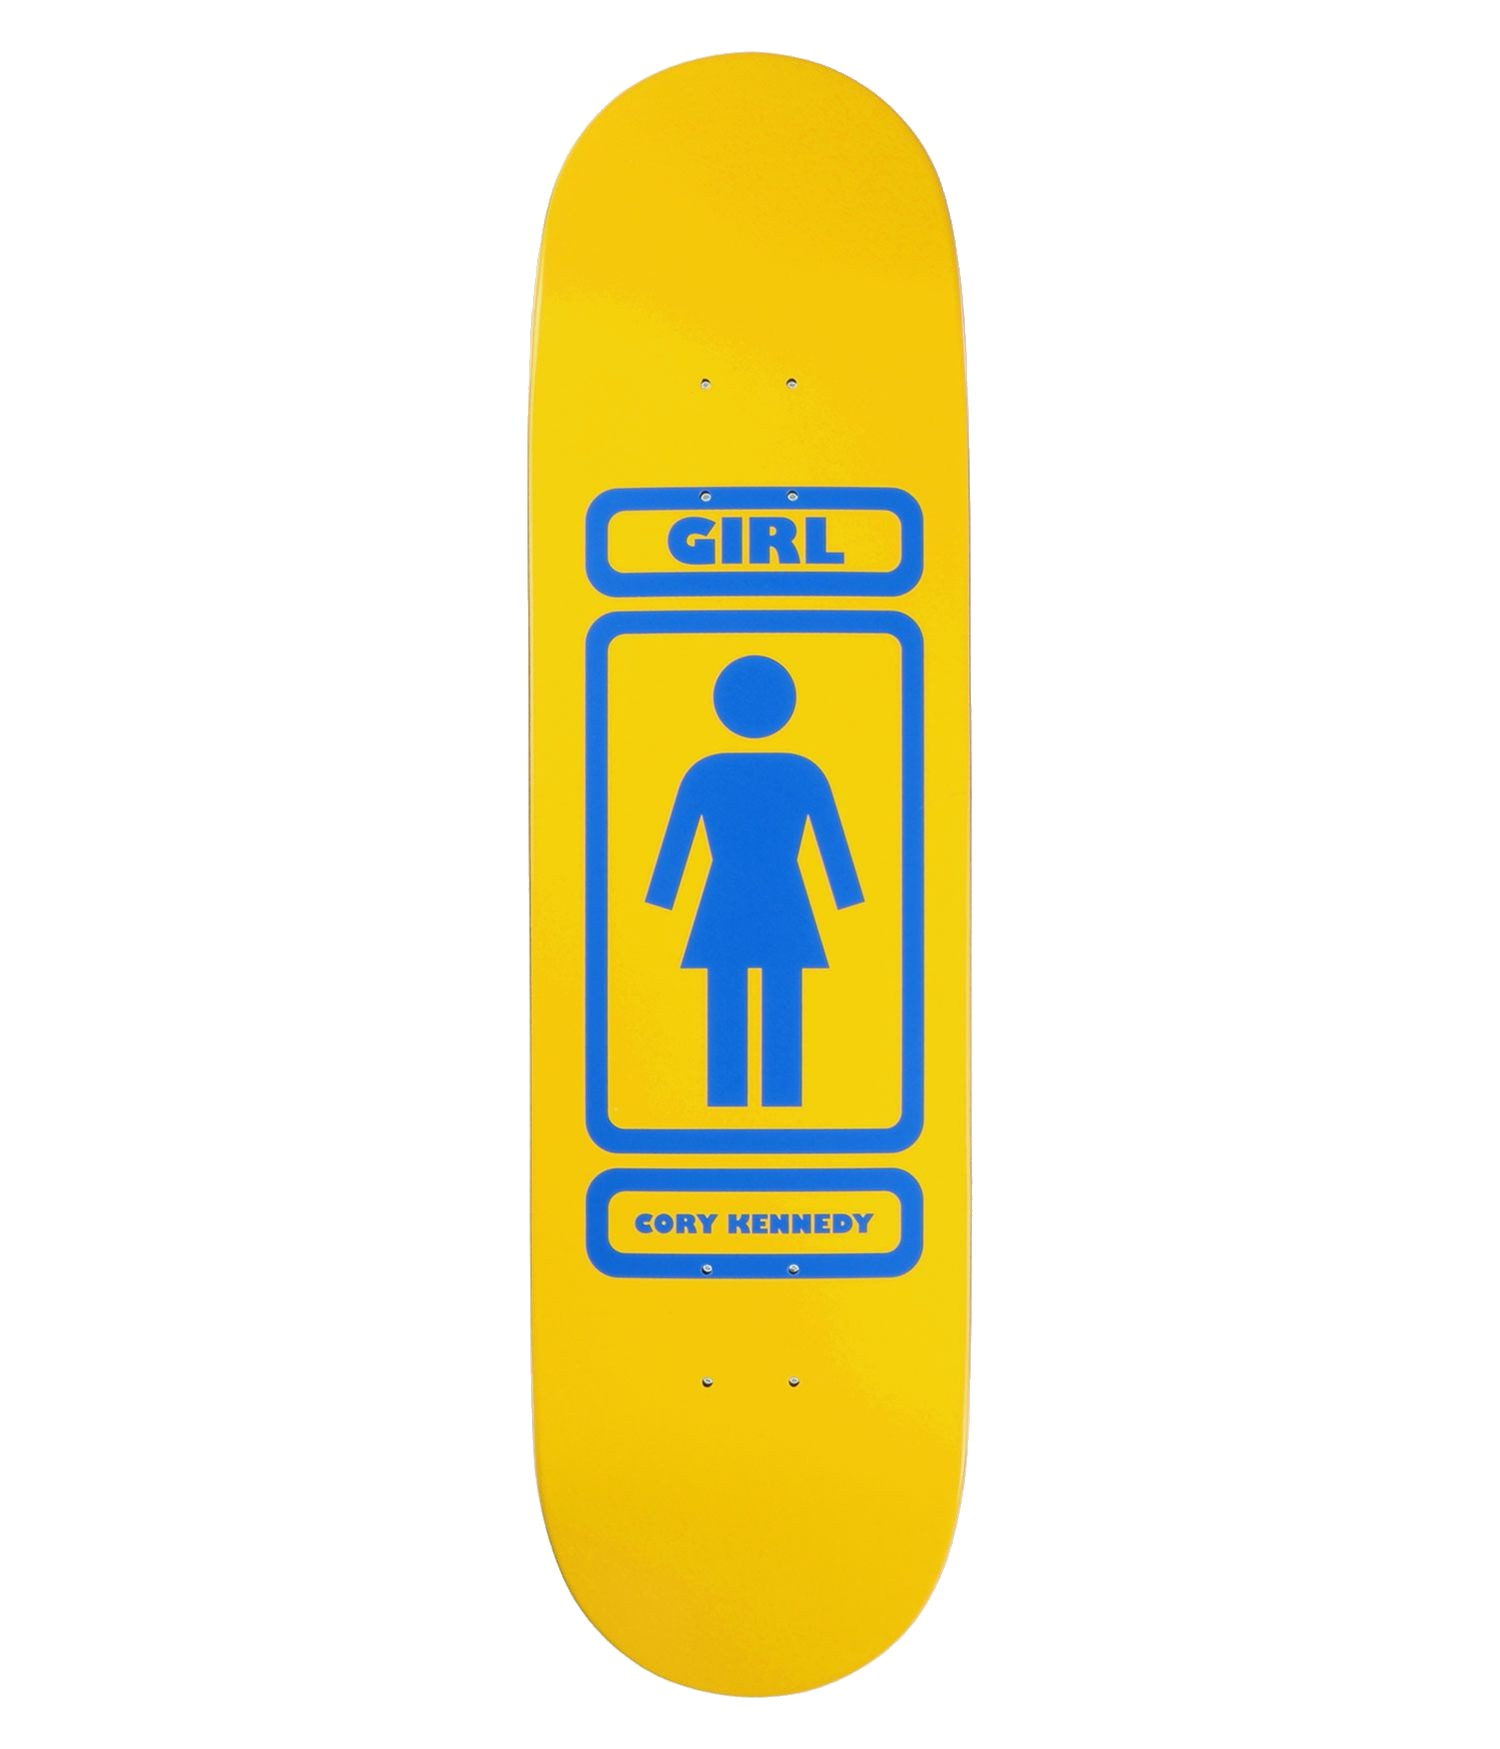 "GIRL KENNEDY 93 TIL 8.375"" SKATEBOARD DECK - YELLOW/BLUE"